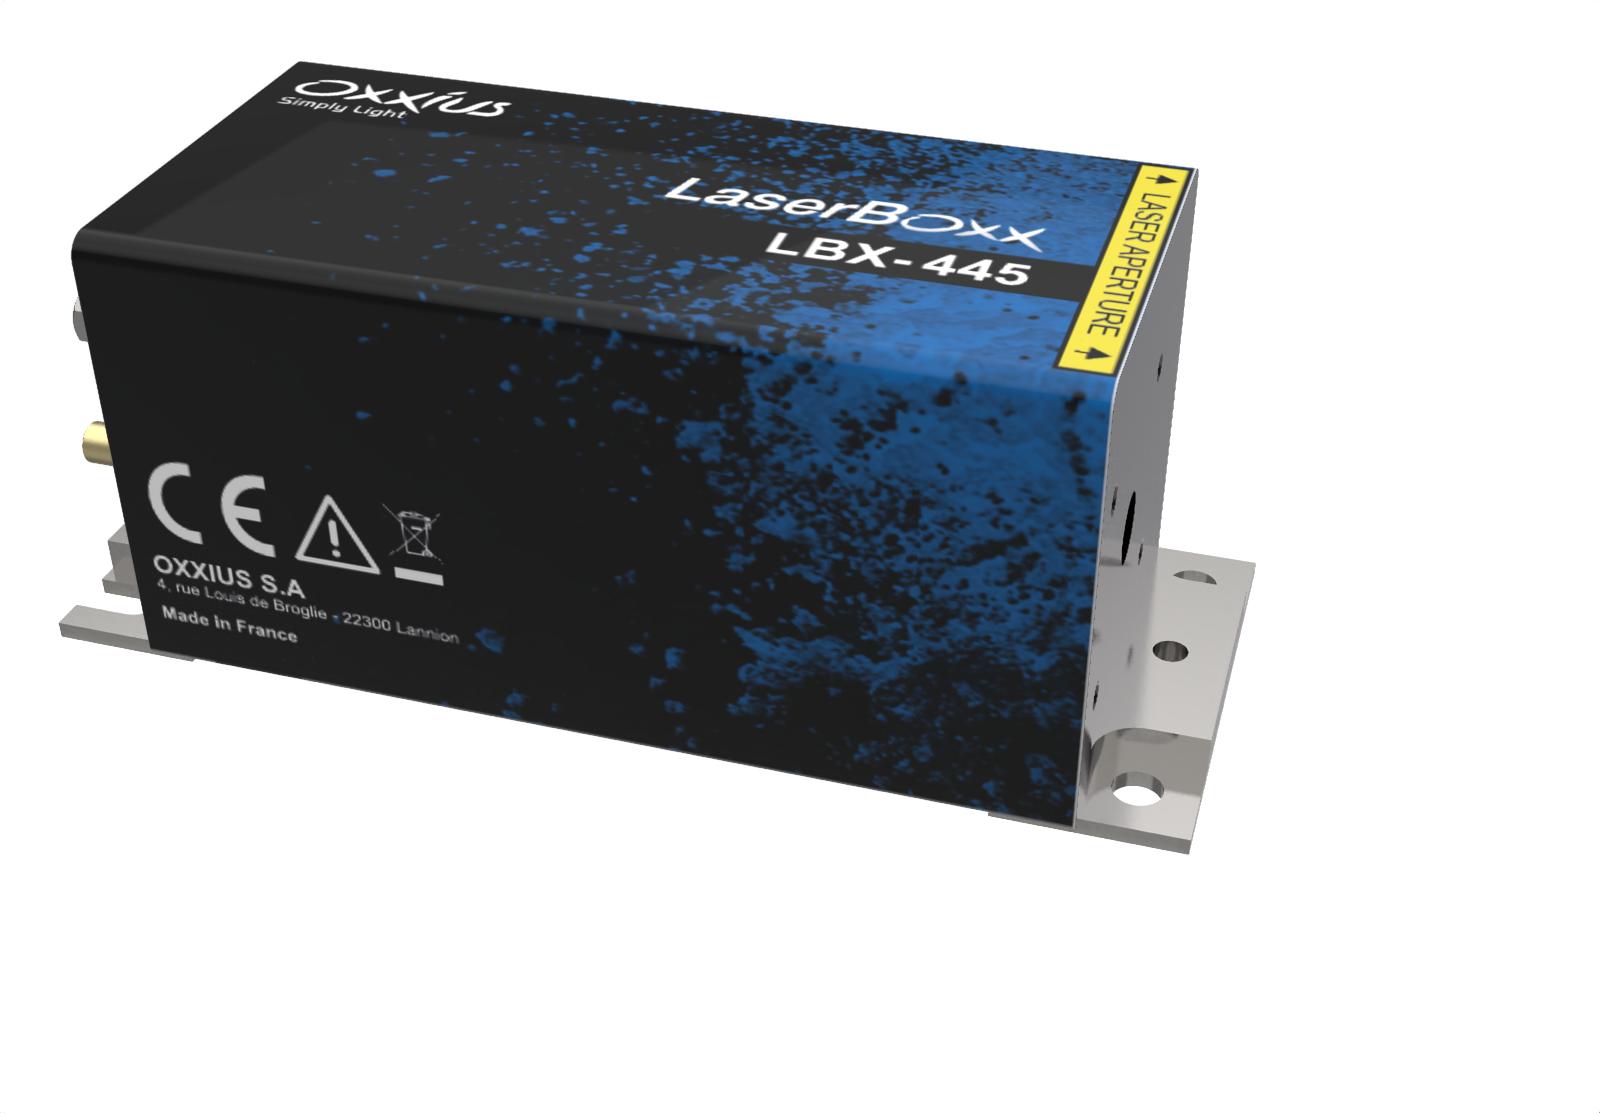 LBX-445-100-CSB